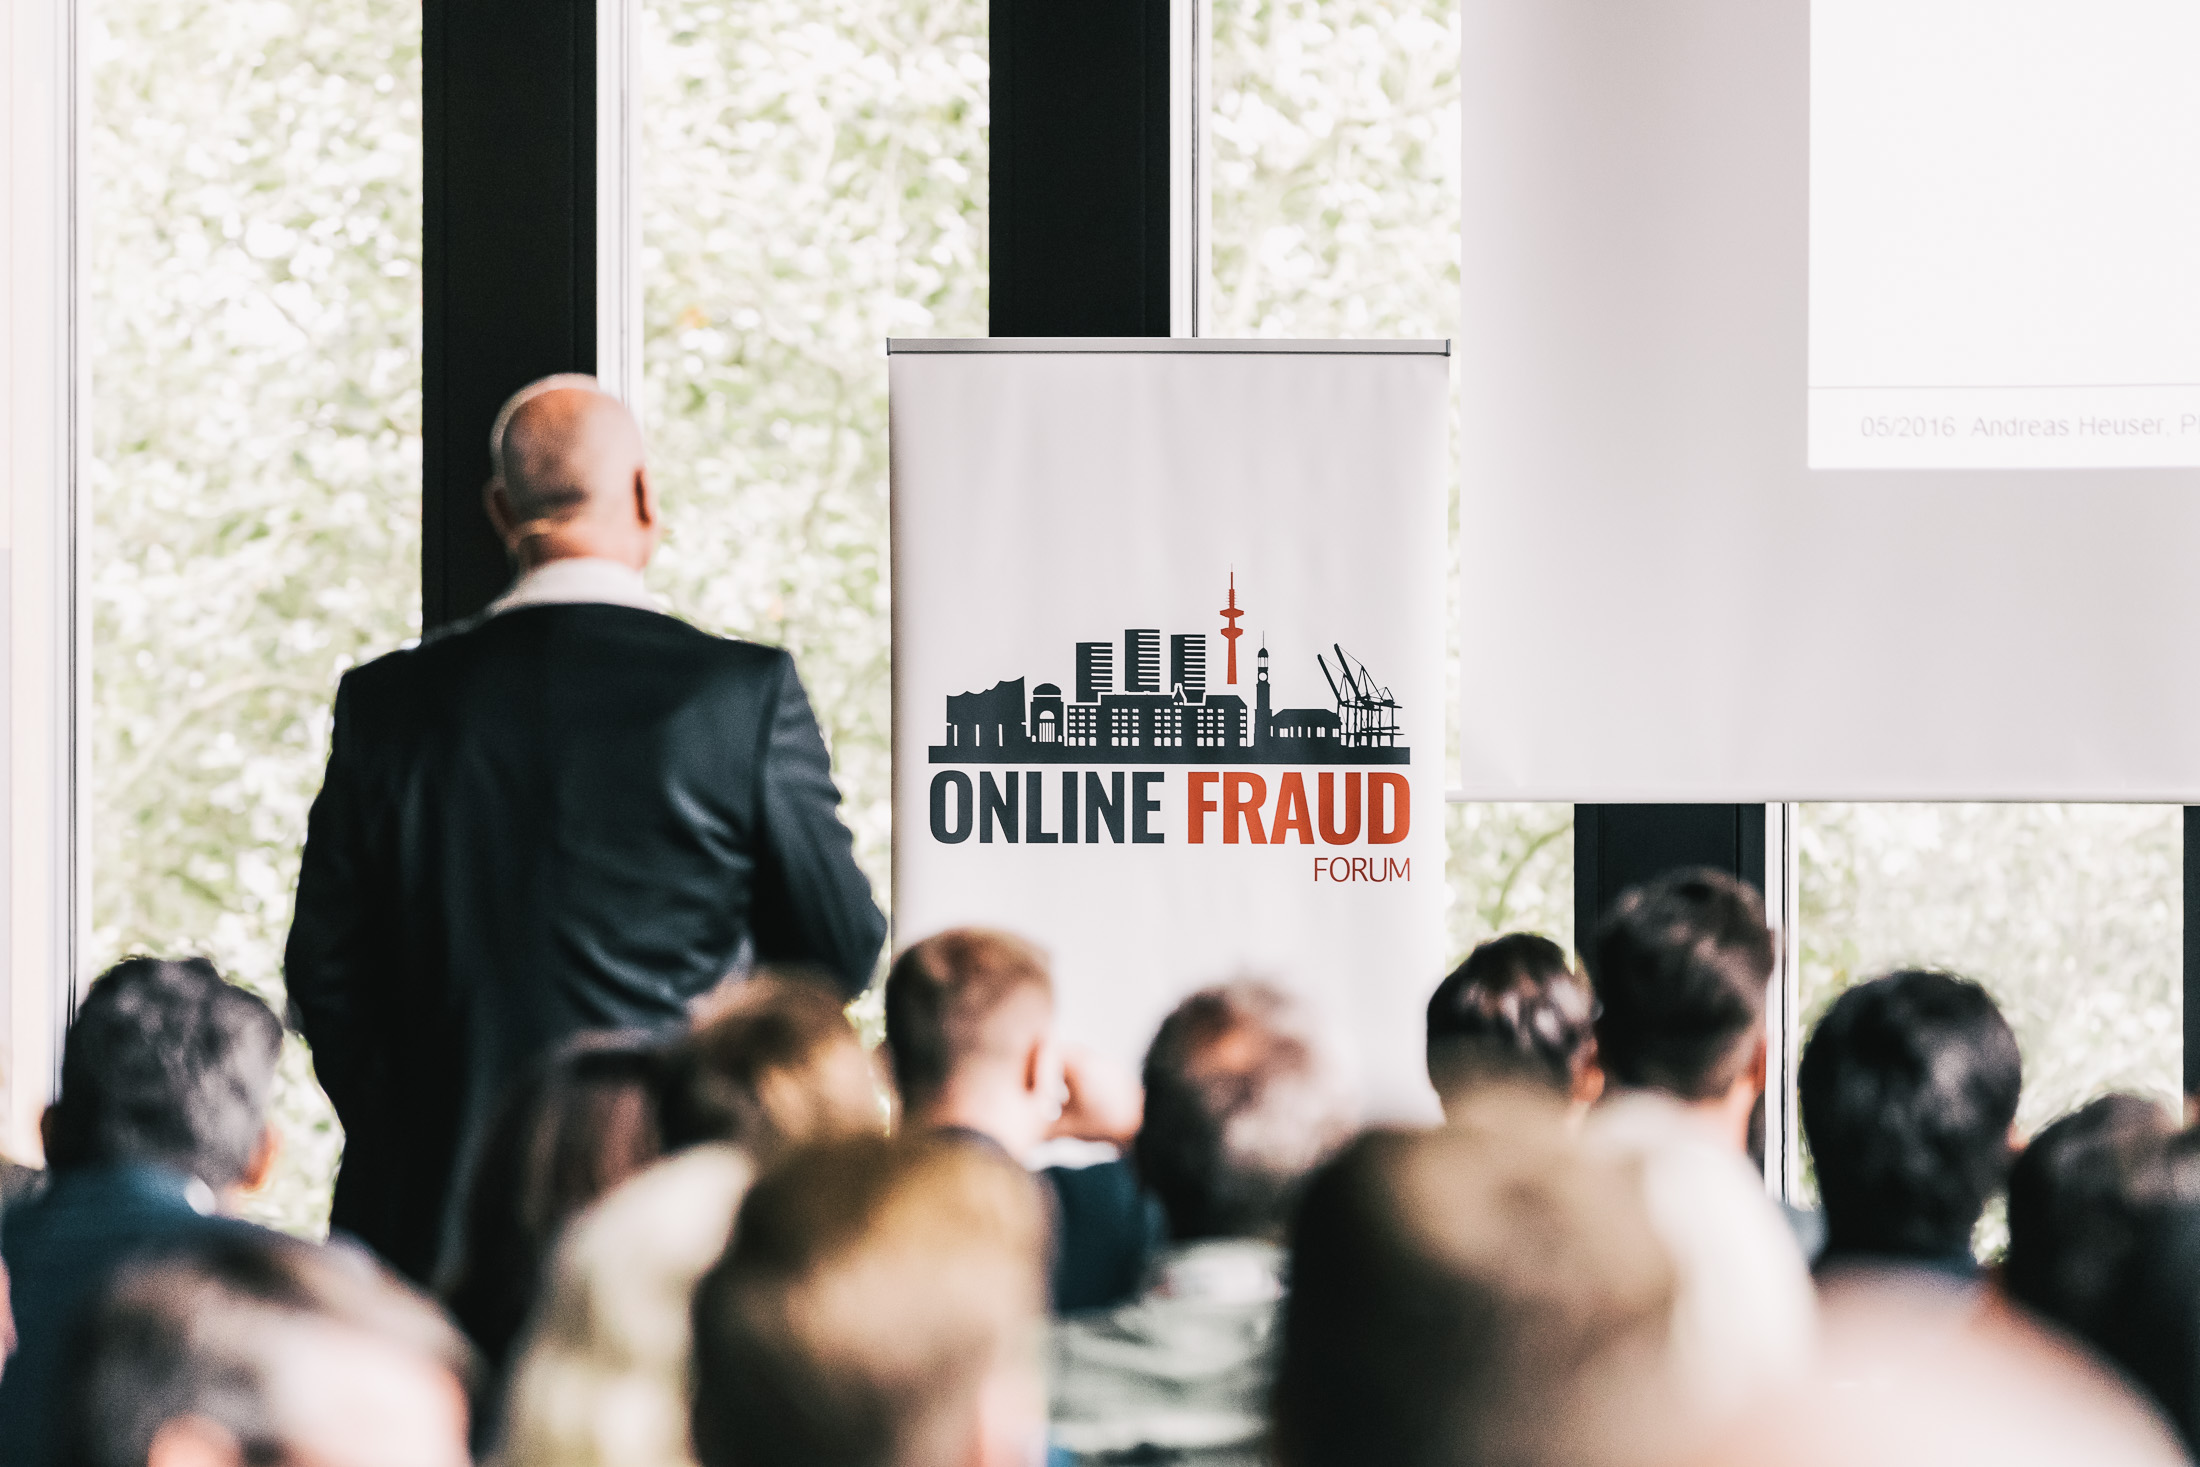 Online Fraud Forum 17